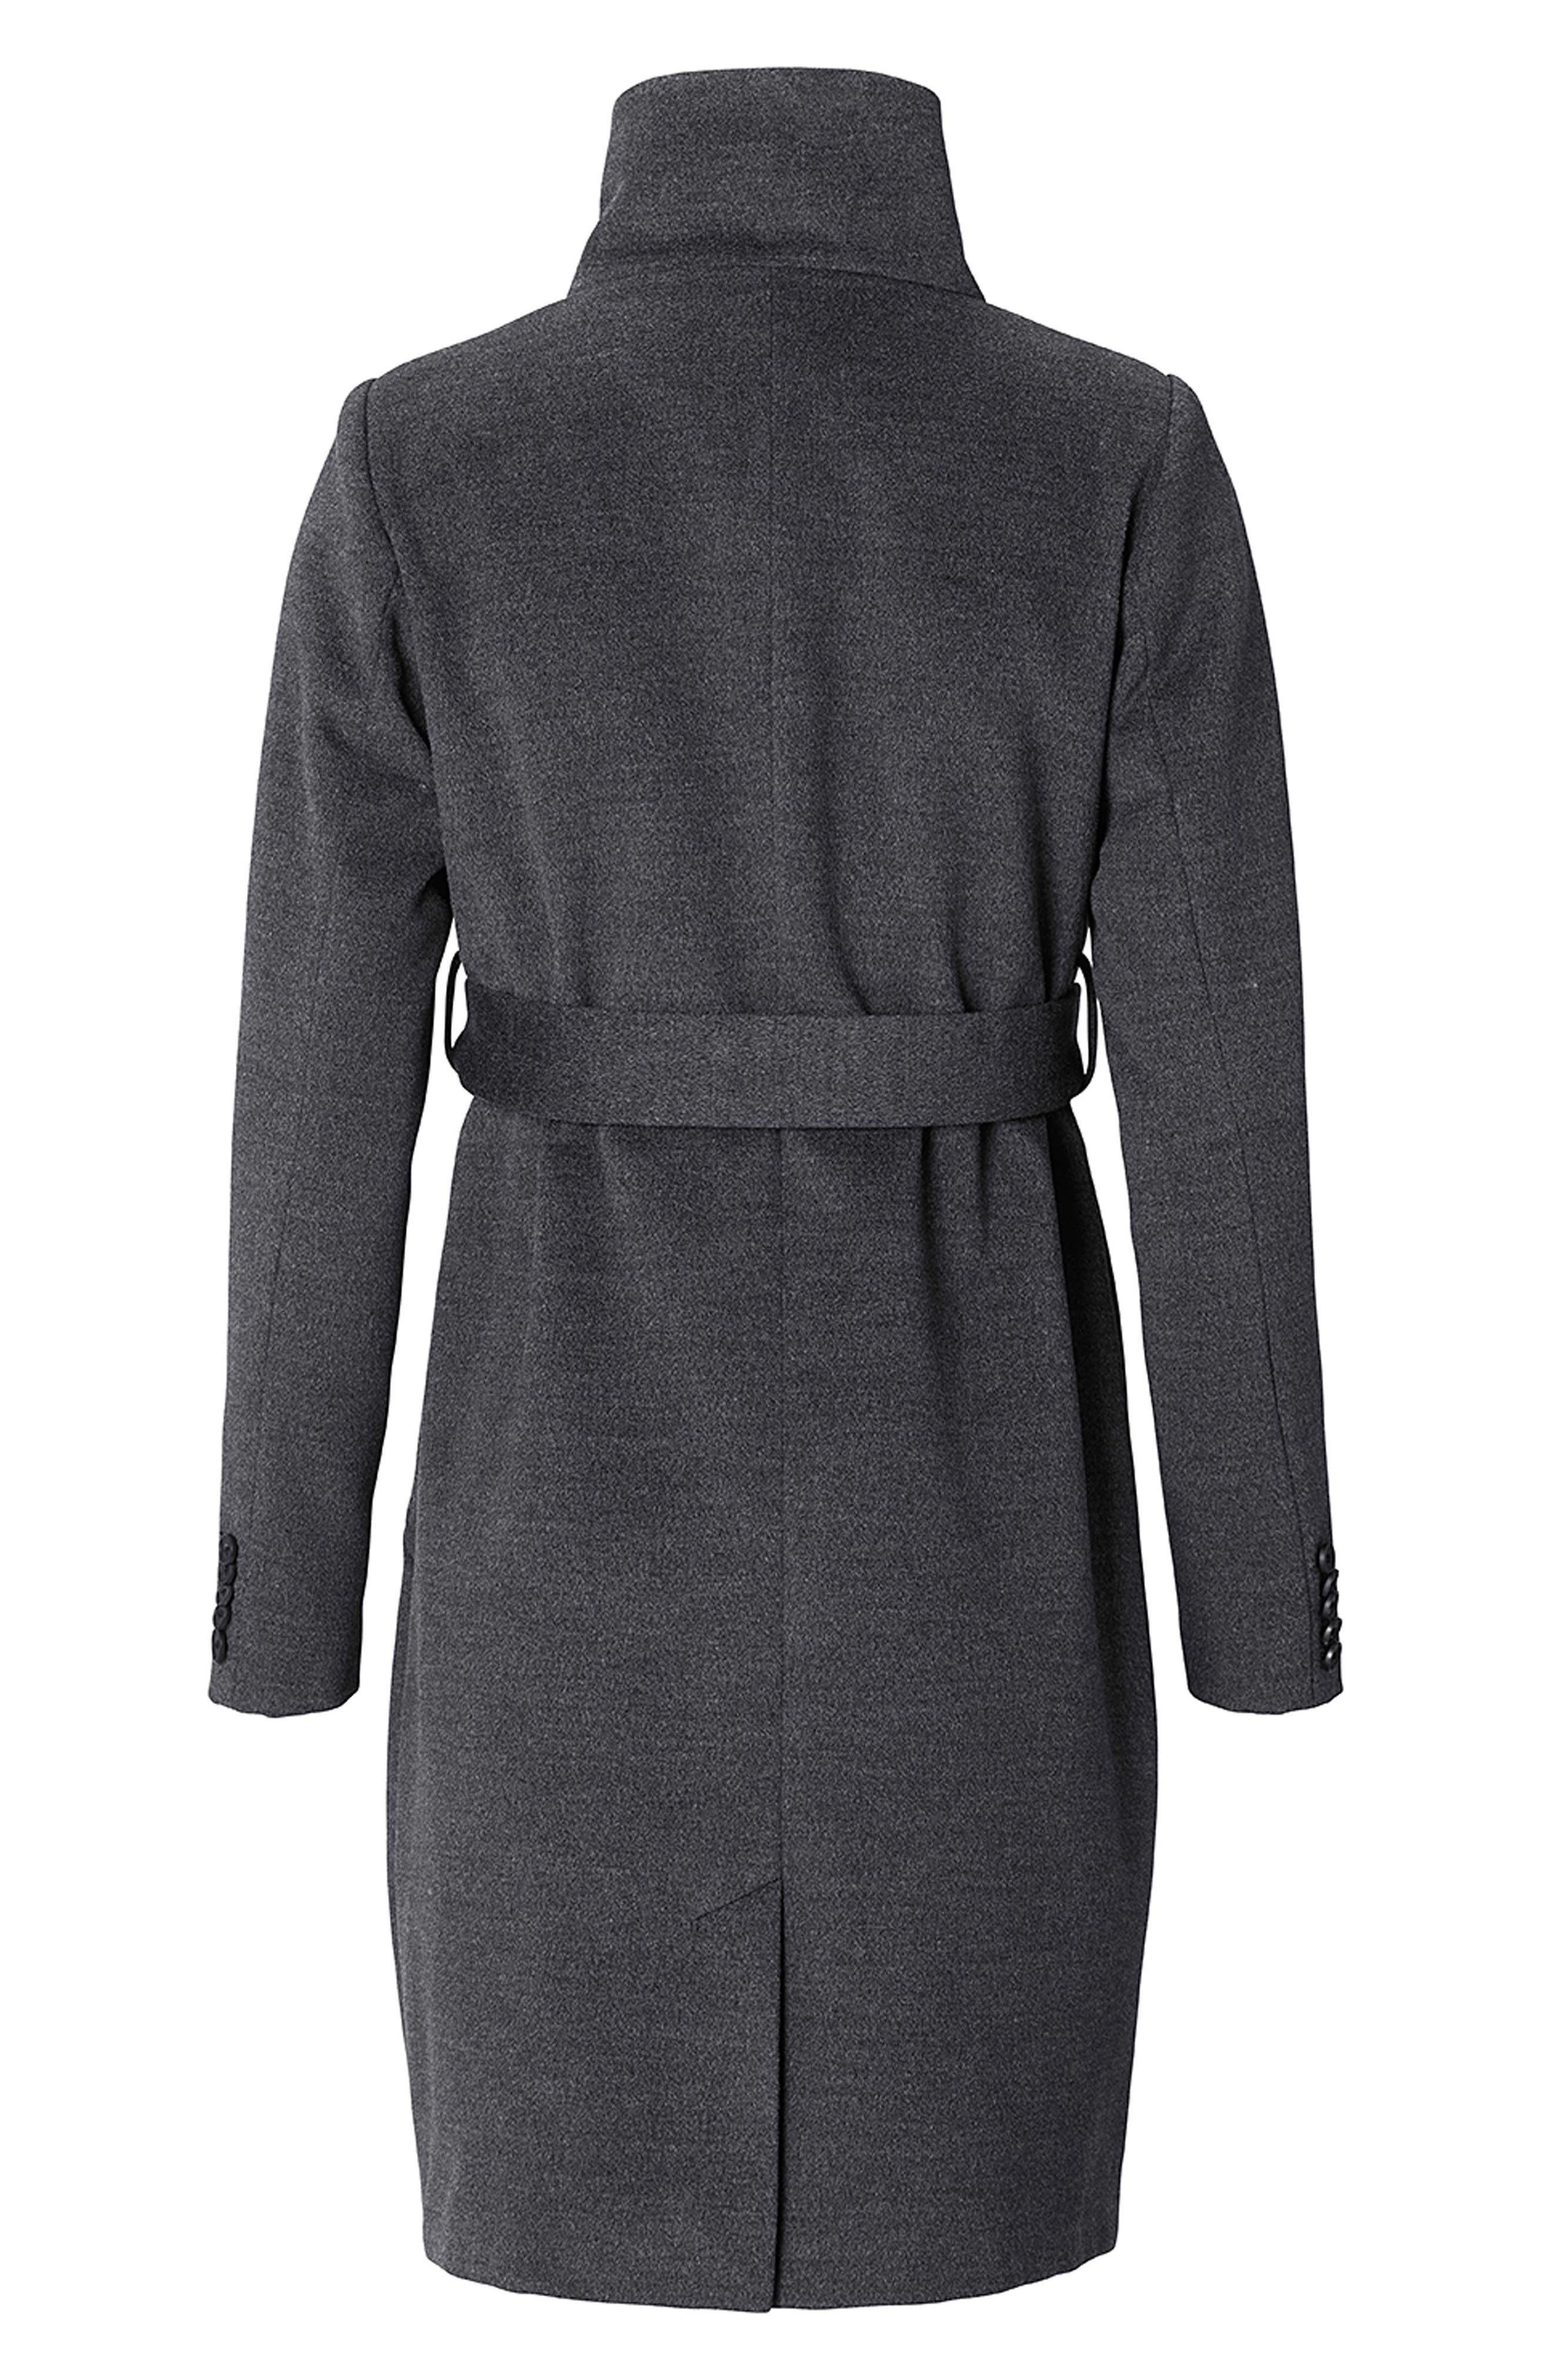 Ilena 2 Maternity Coat,                             Alternate thumbnail 4, color,                             BLACK MELANGE